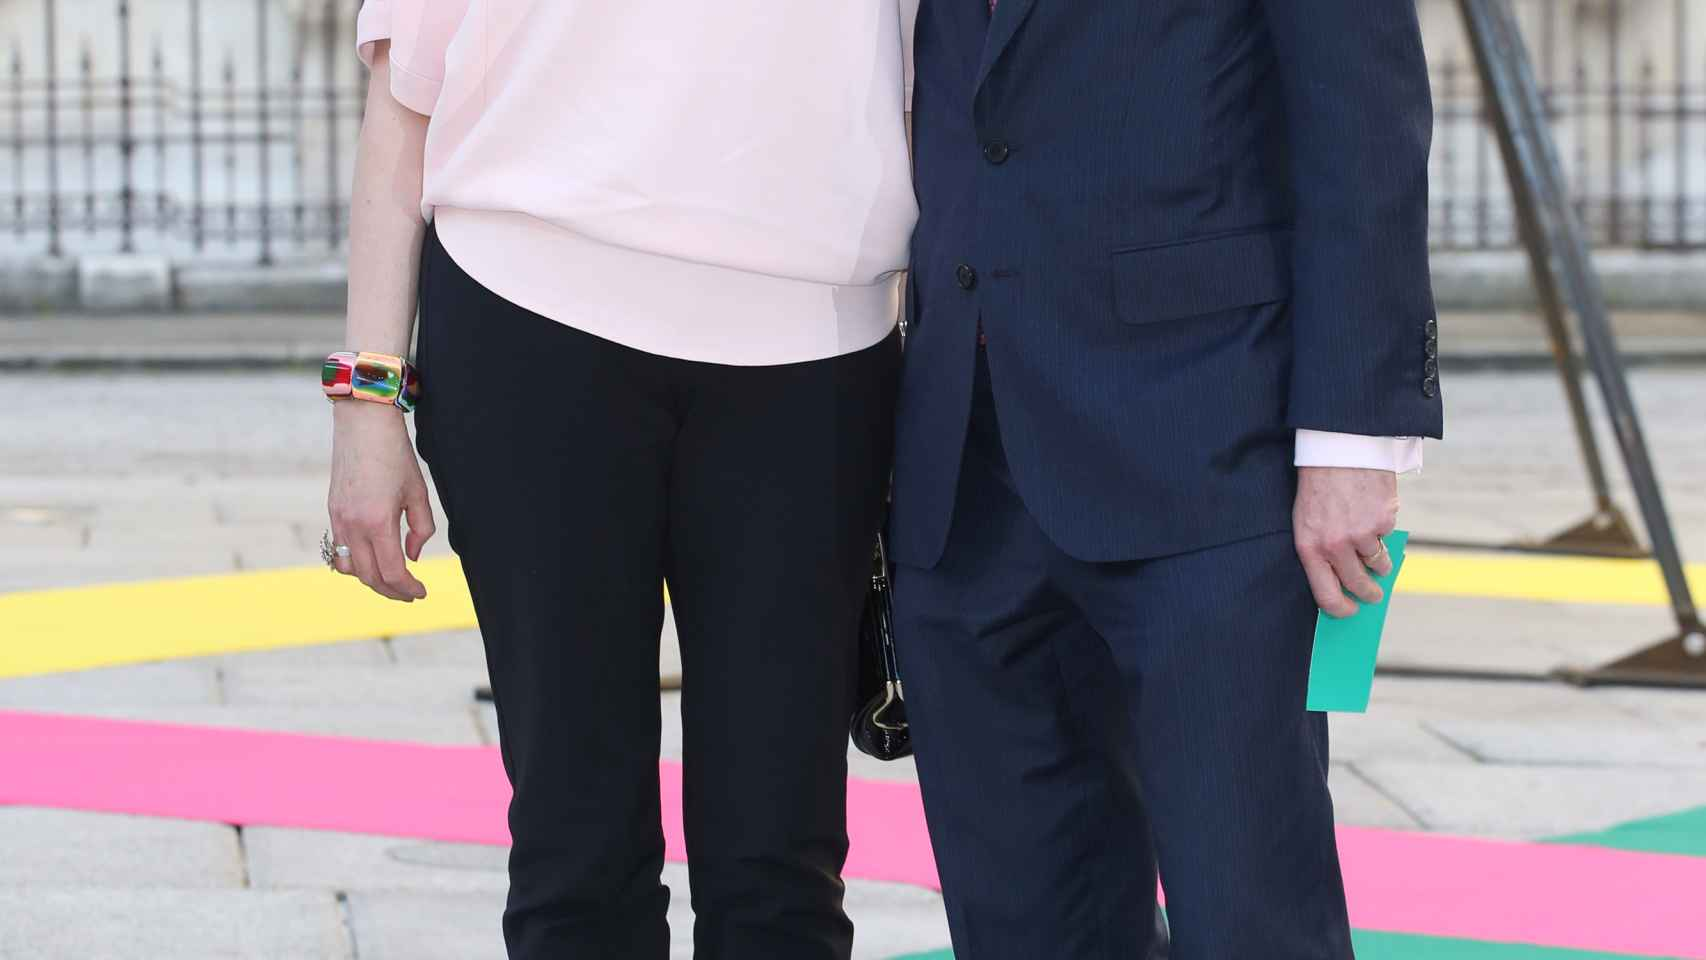 Theresa y Philip May no han podido tener hijos.